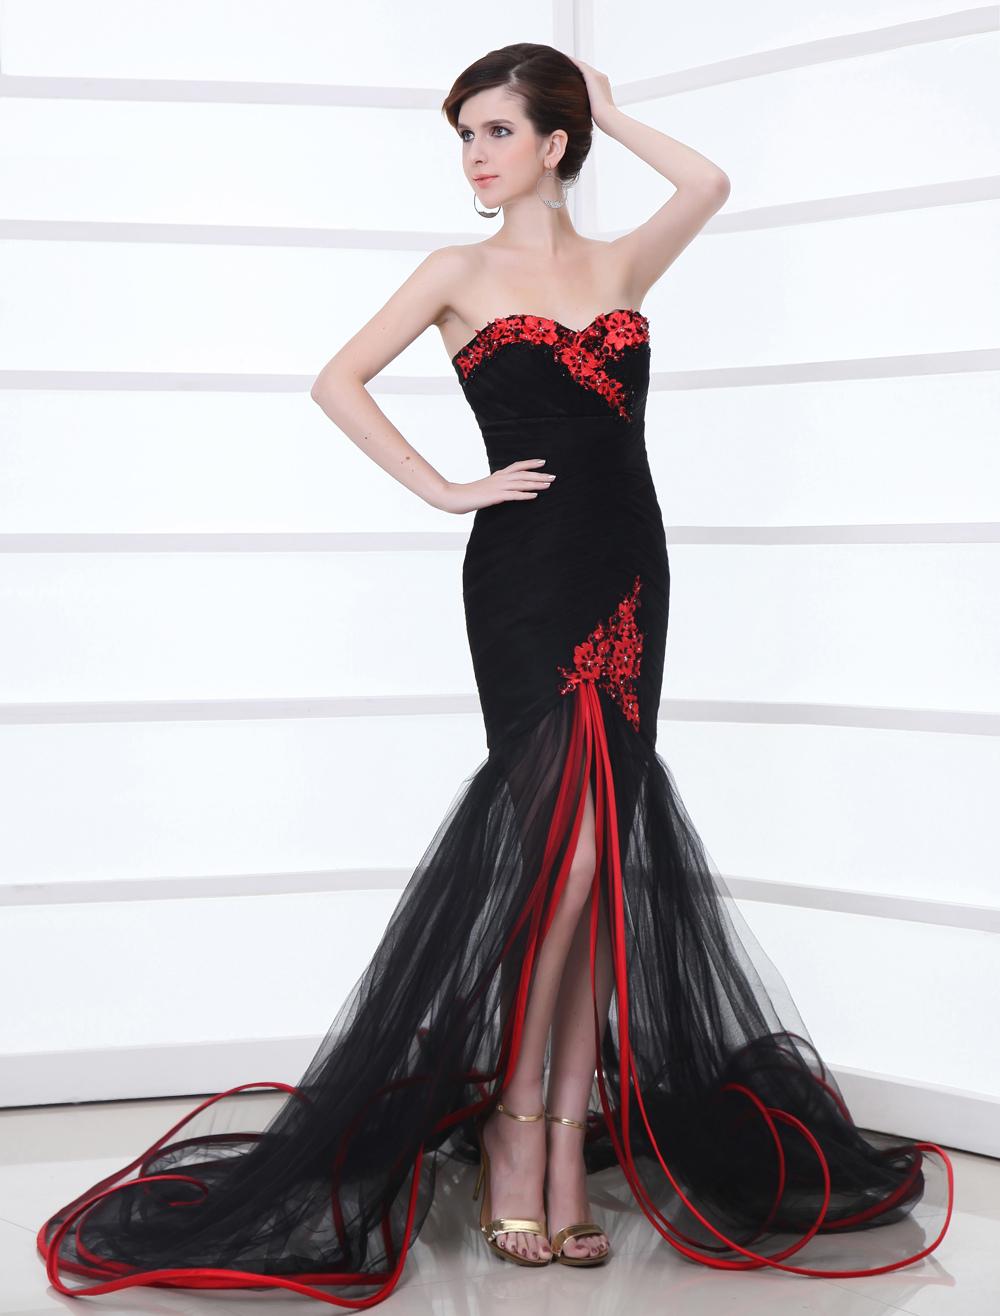 2177b9ed28f5 Mermaid Black Wedding Dress Split Red Trim Lace Applique - Milanoo.com